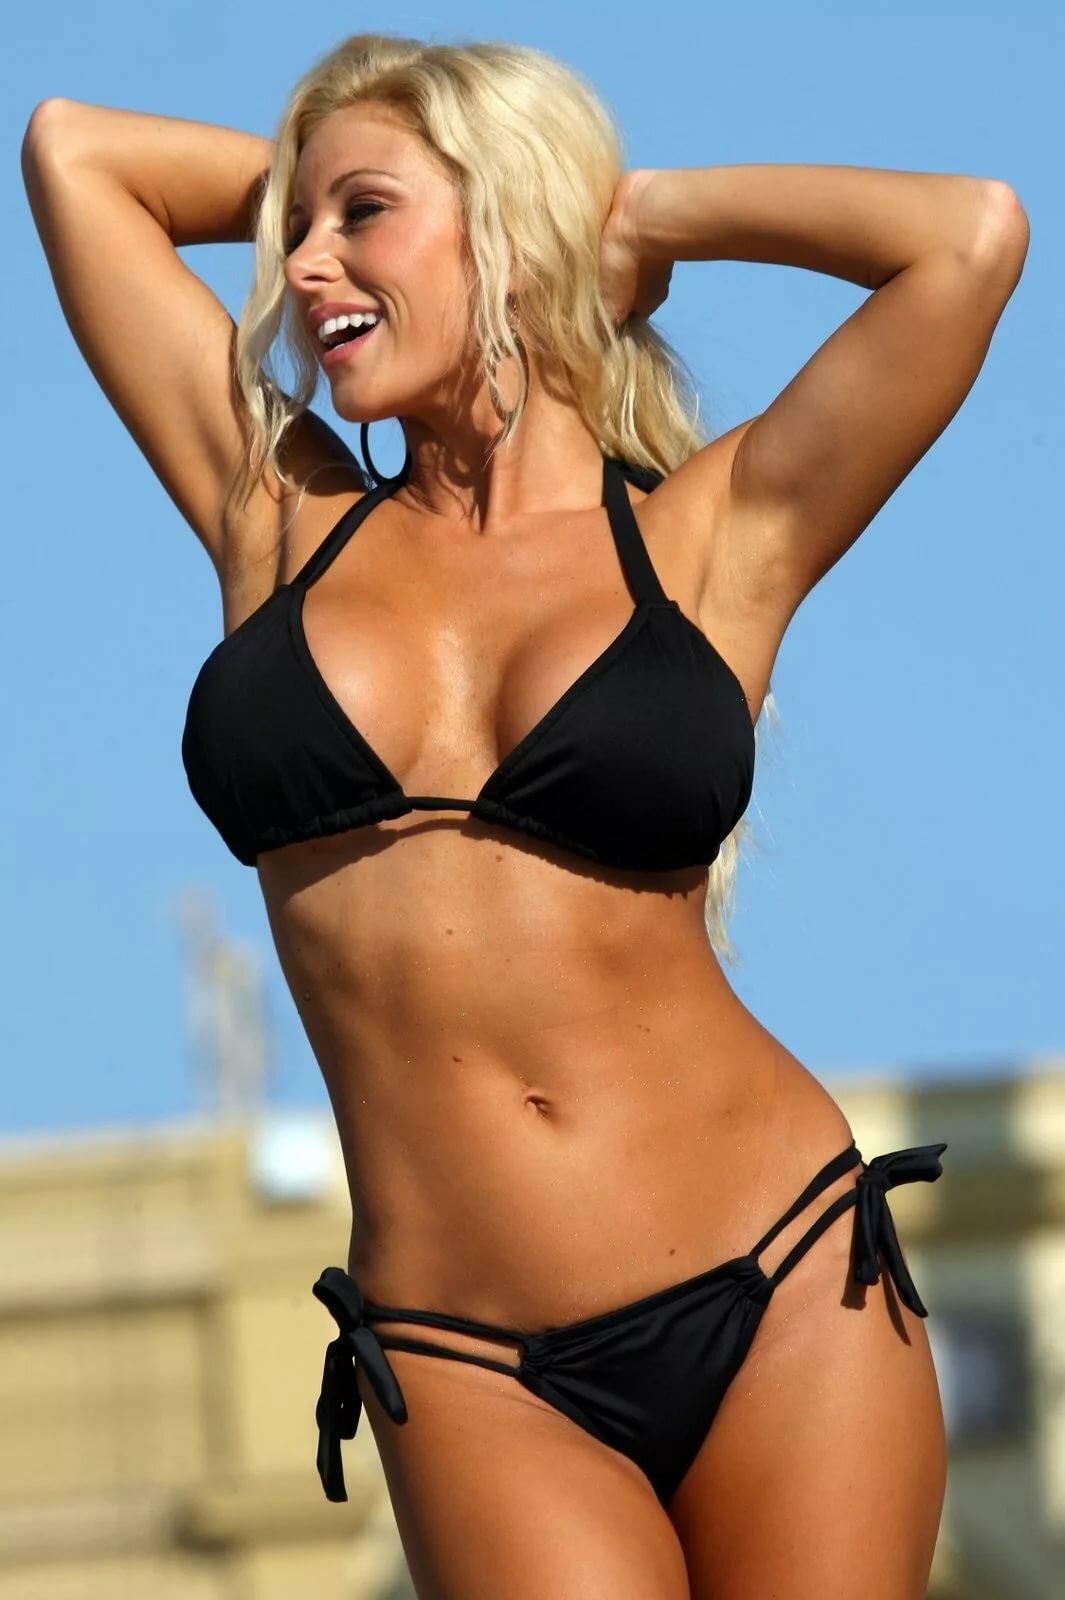 Bikini girl tsa — pic 12